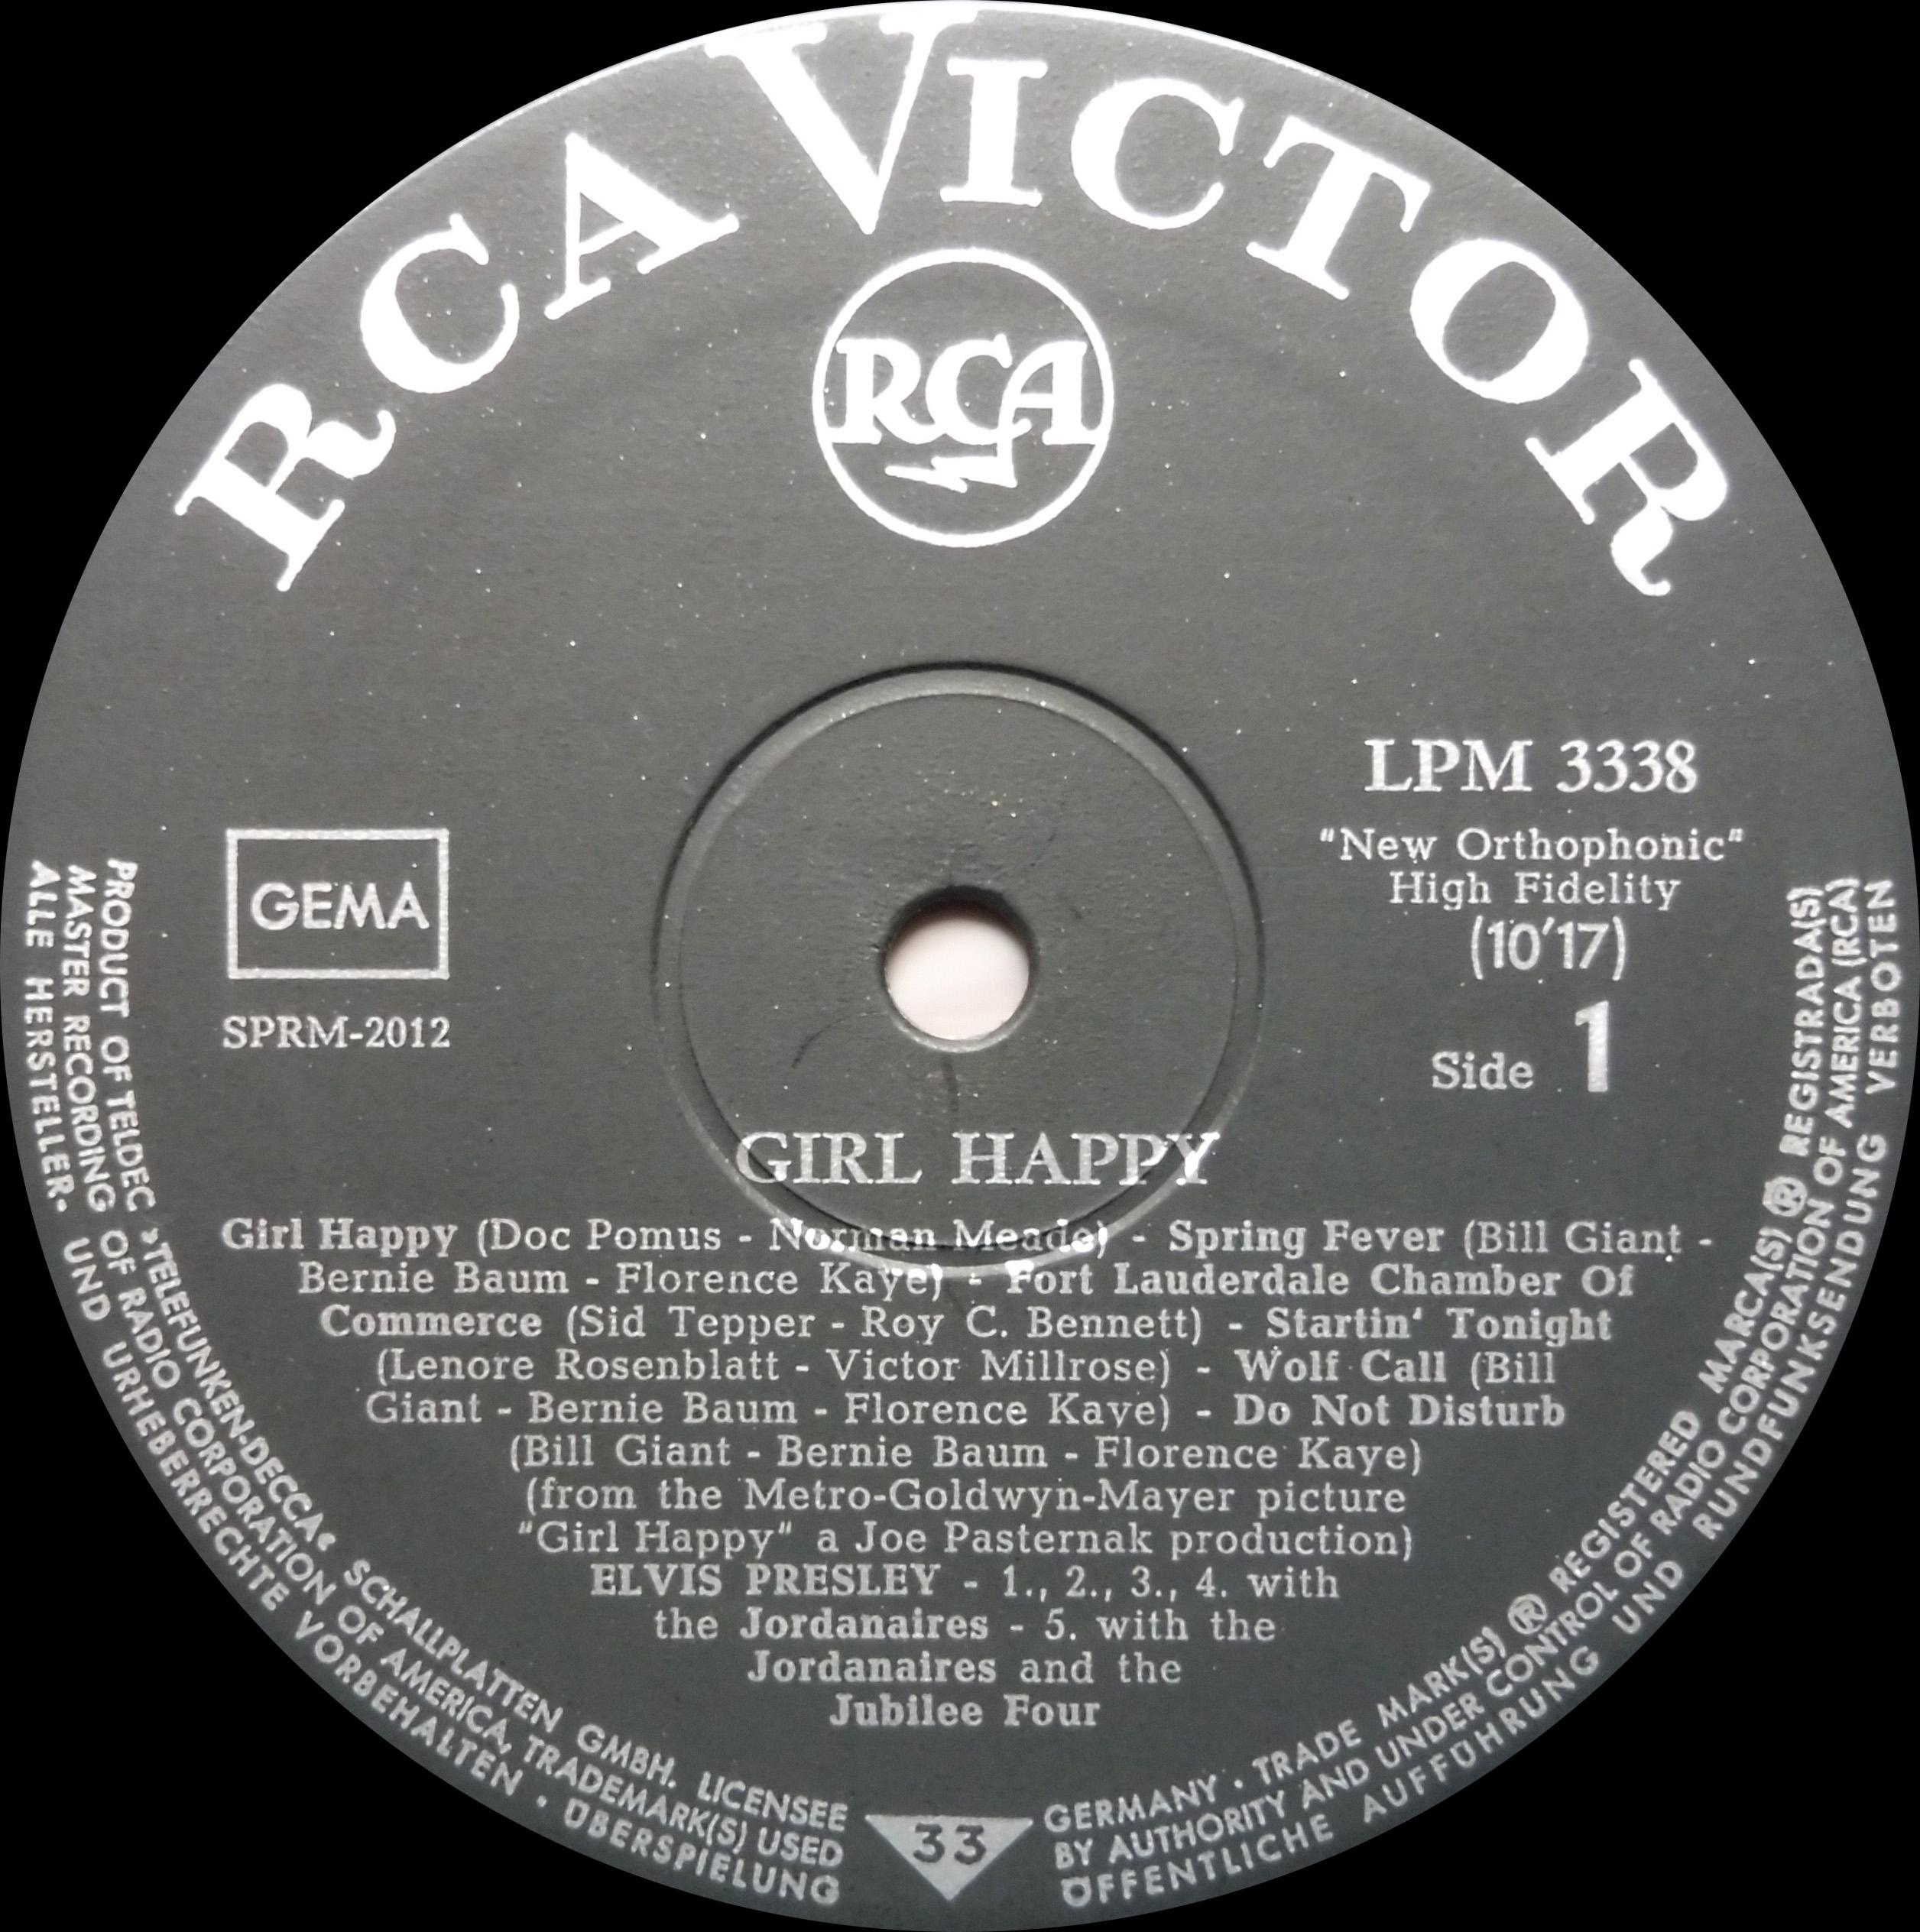 GIRL HAPPY Girlhappy65lpmside1v8fl5